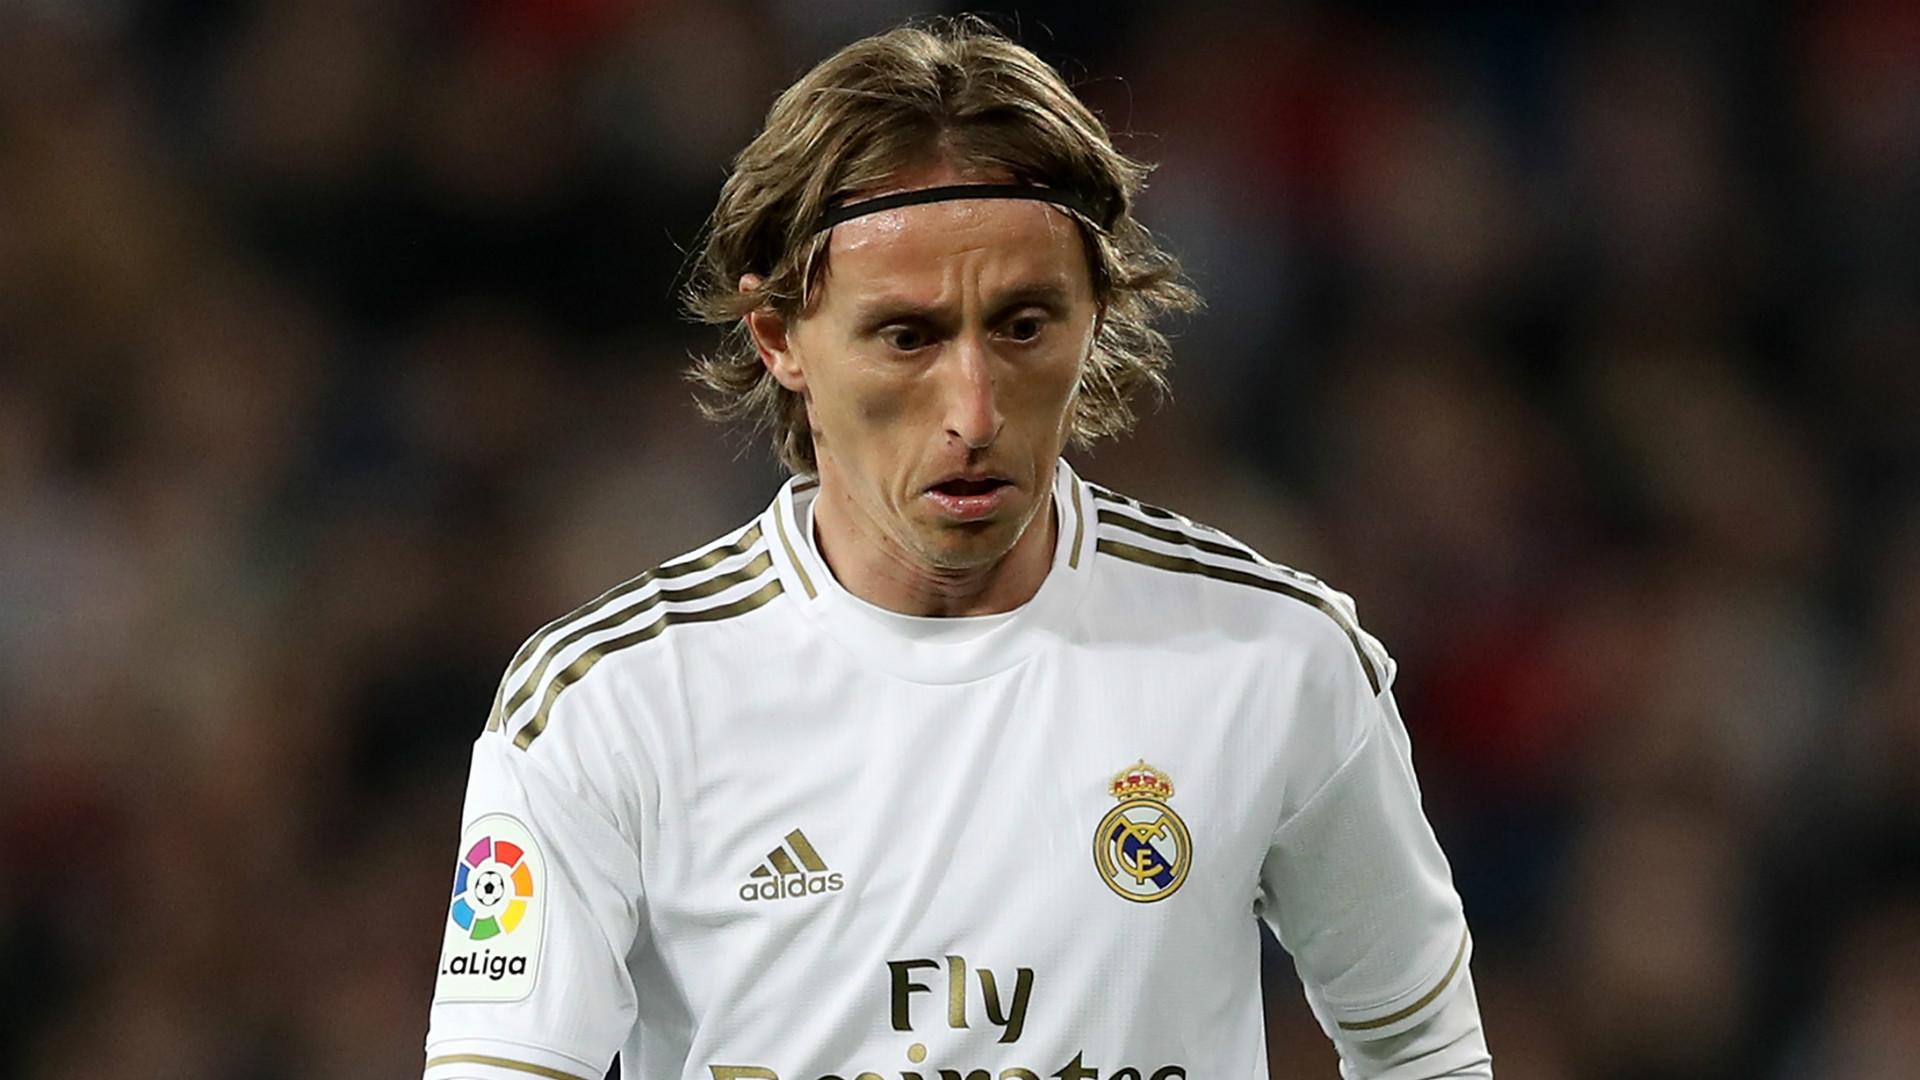 Mercato - Real : Modric ira bien jusqu'au bout de son contrat, en 2021